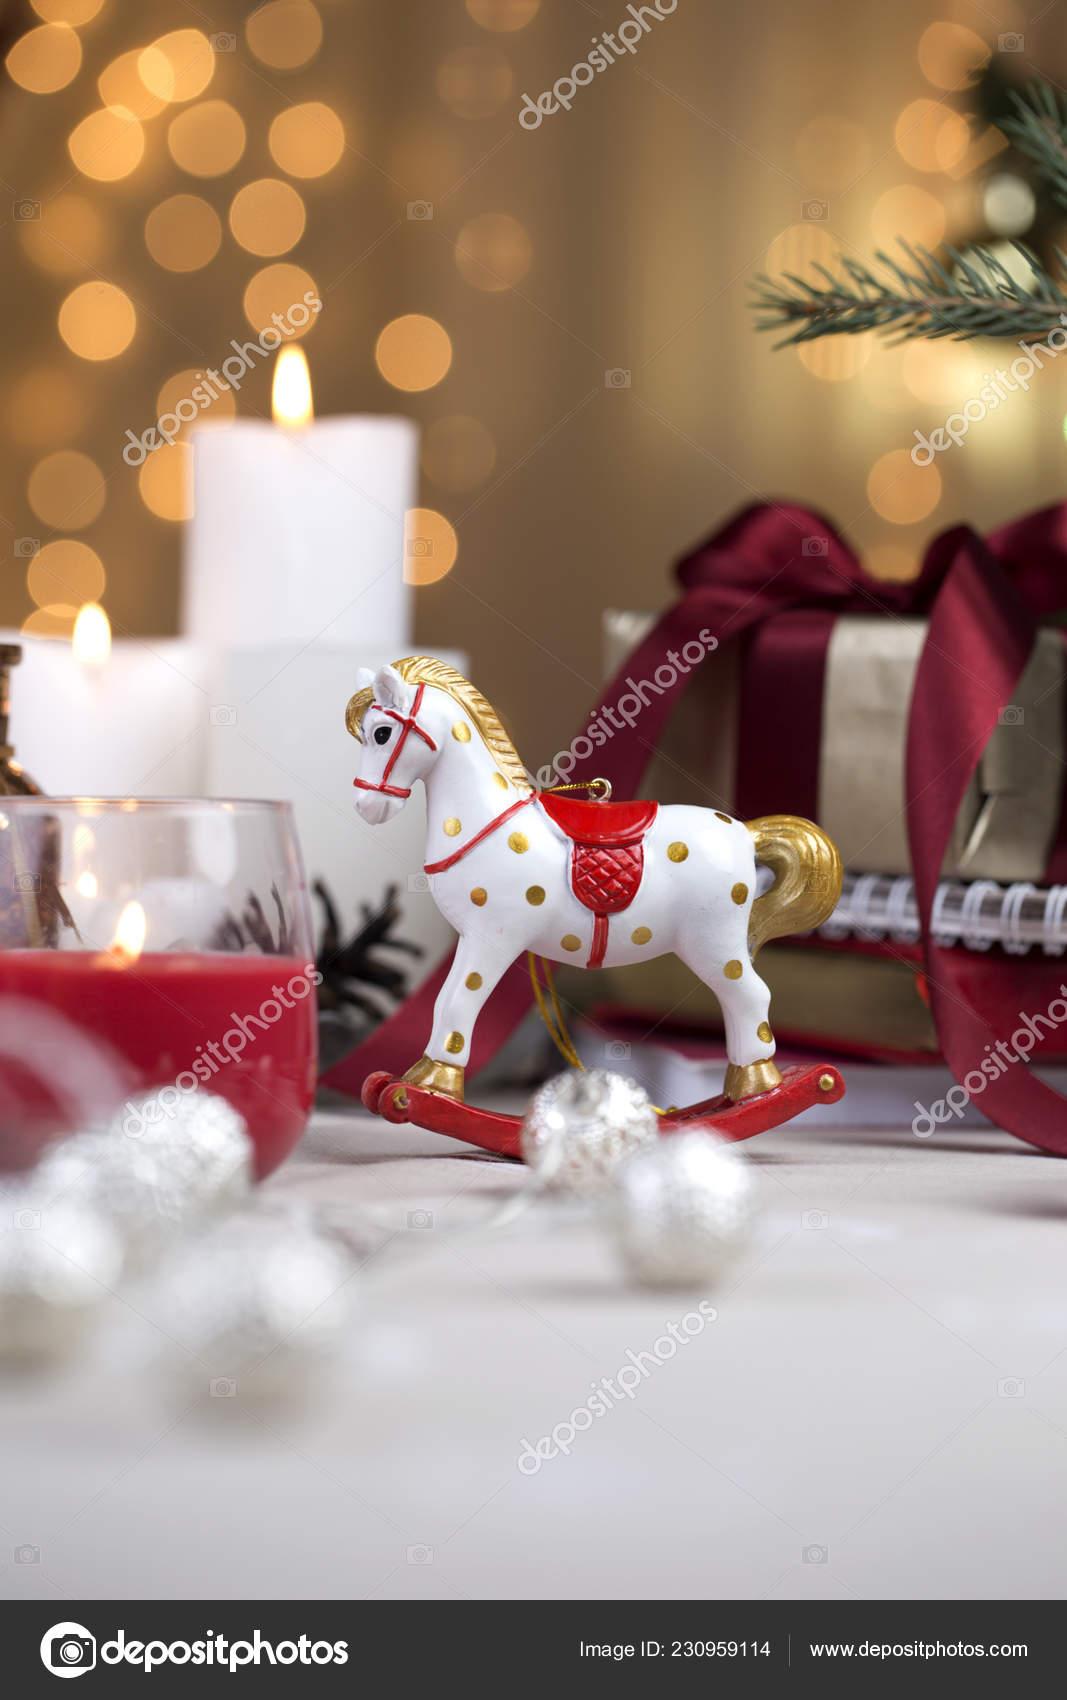 Christmas Rocking Horse Wooden Horse Christmas Decoration Background Greeting Card Stock Photo C Kate Ovcharenko 230959114